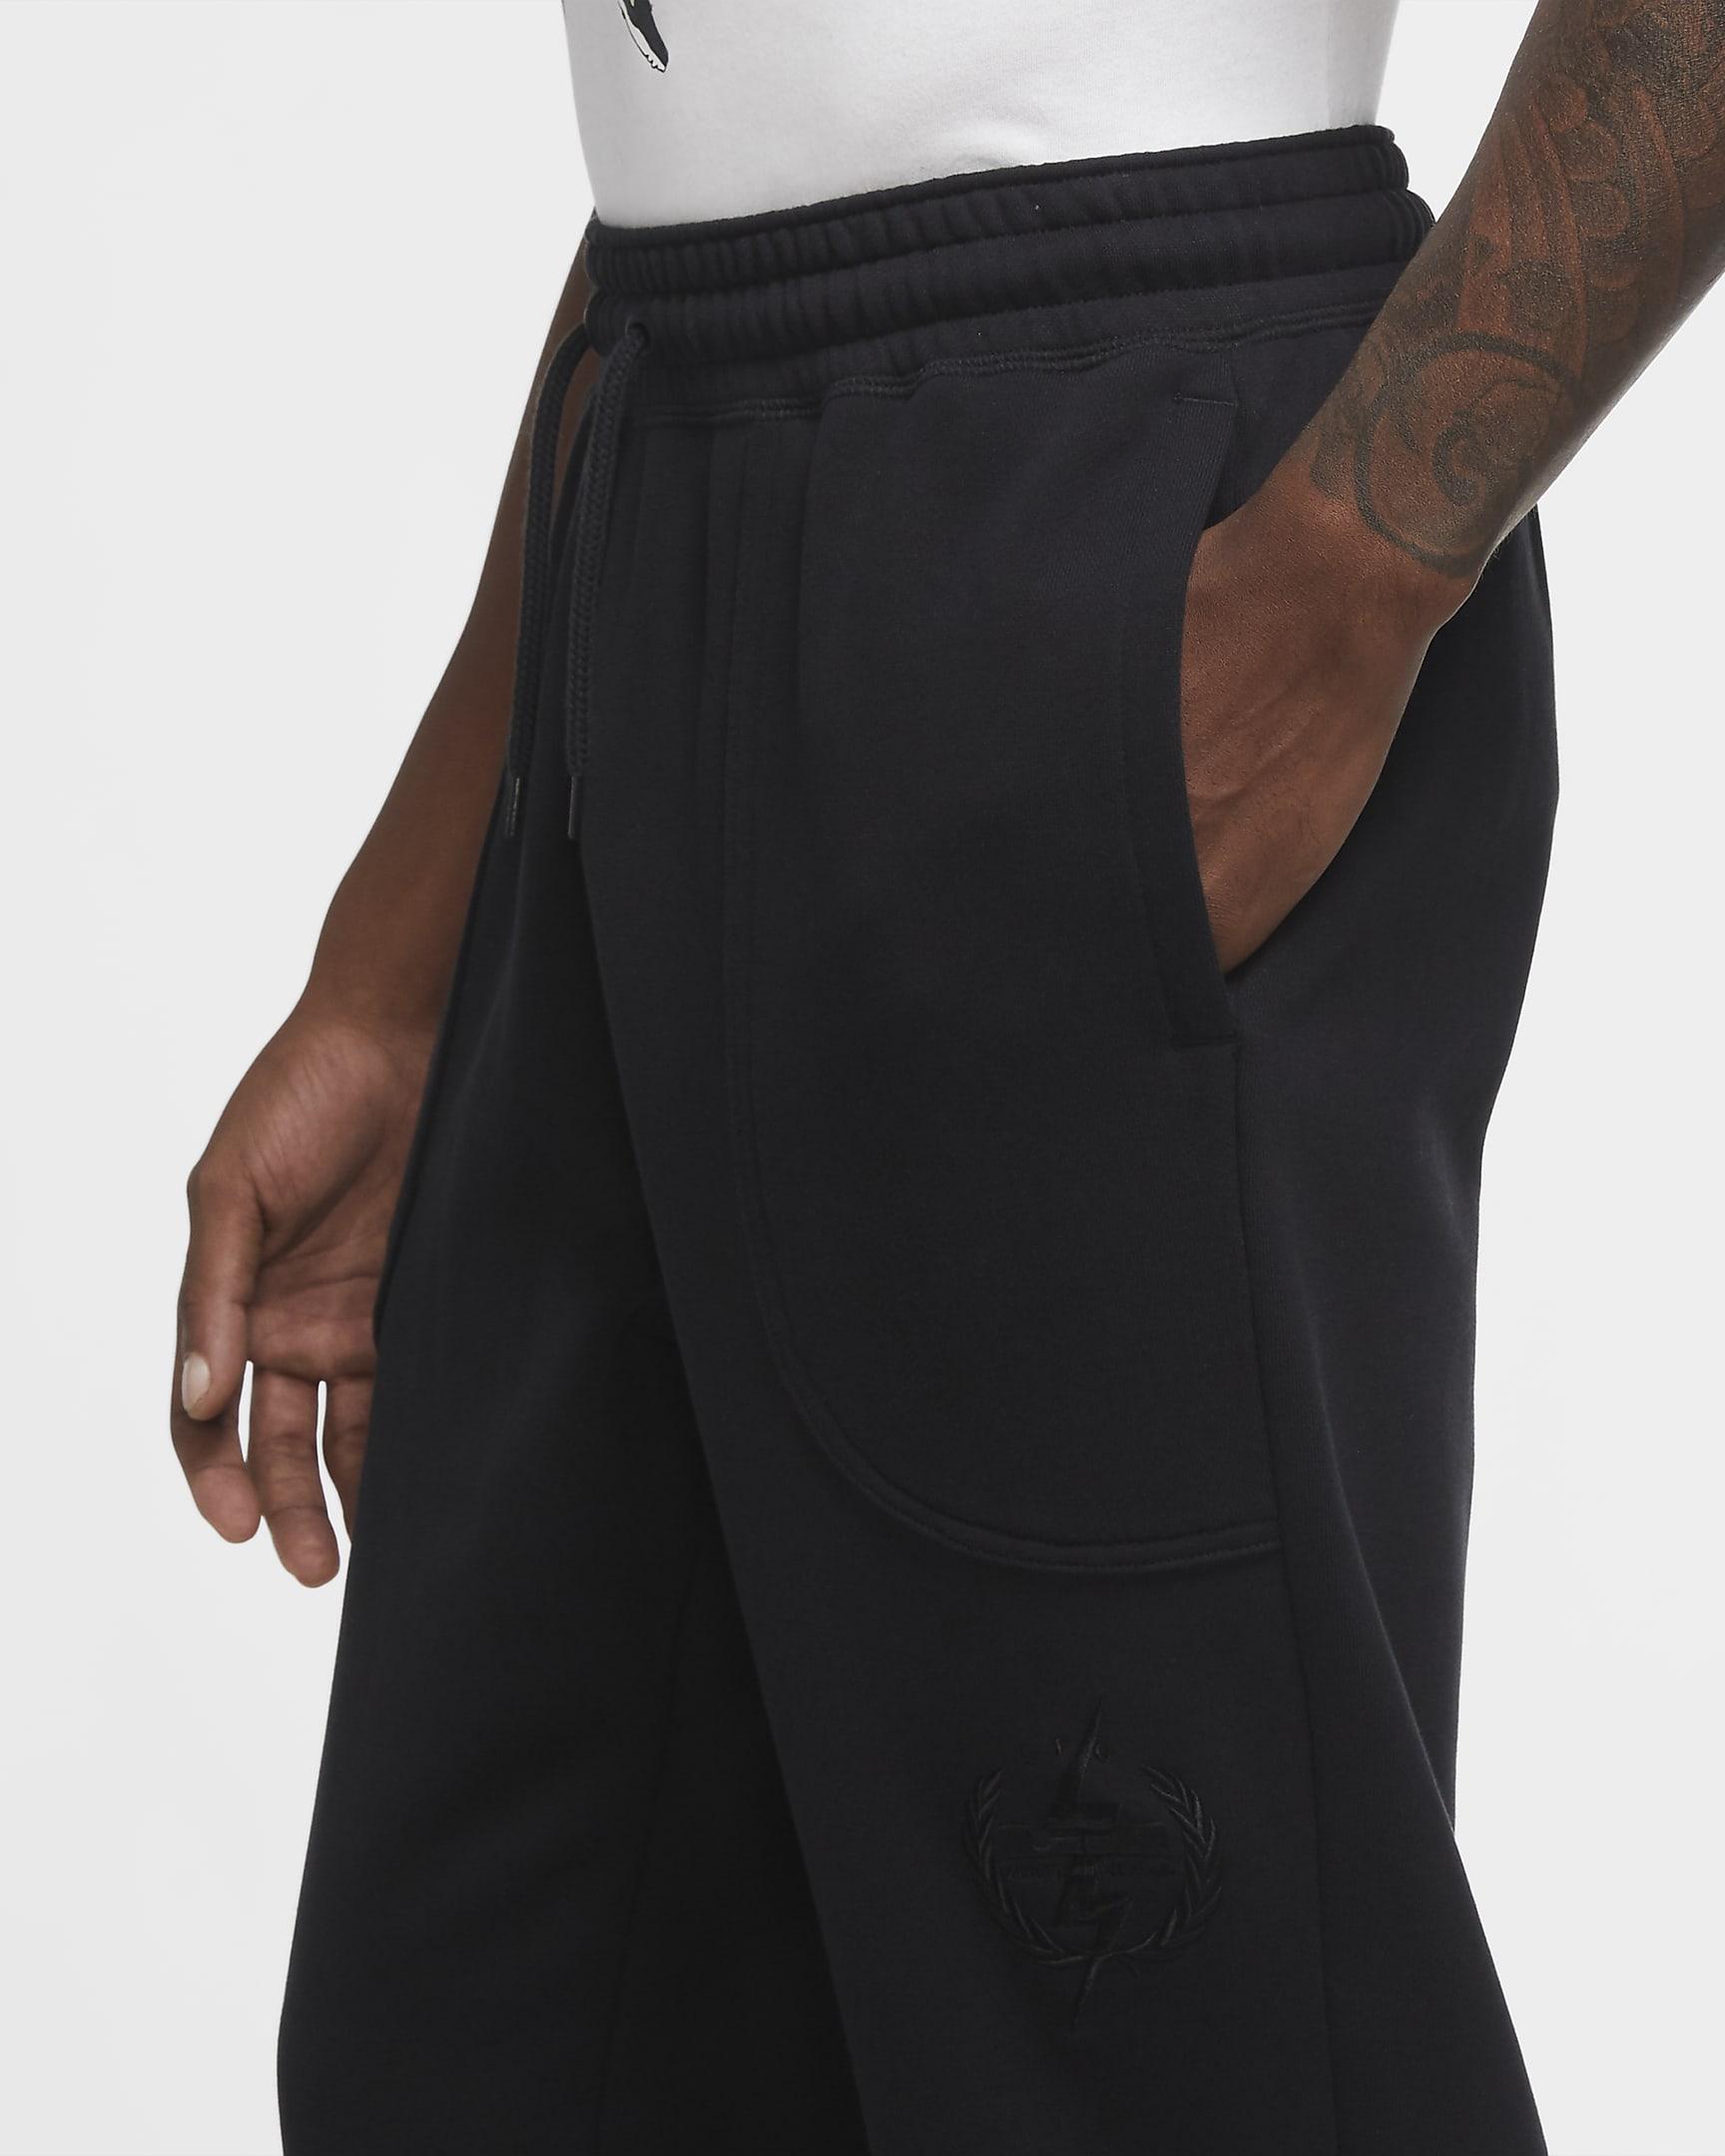 lebron-mens-basketball-pants-G2h2Gl